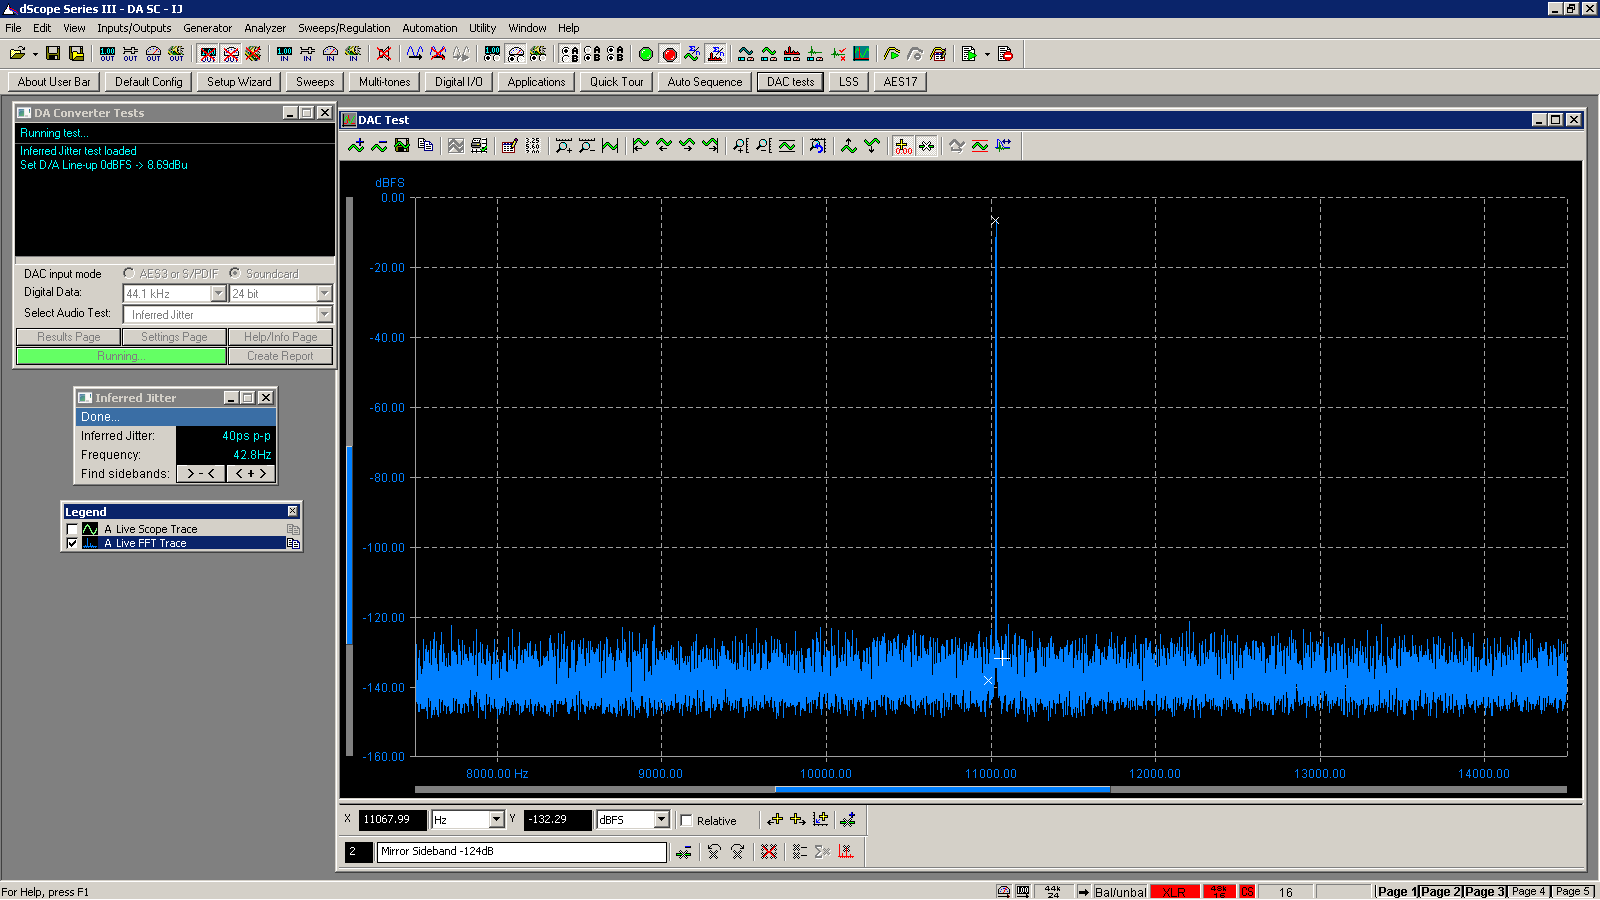 20160812 Modi MB inferred jitter - u12 - spdif.png